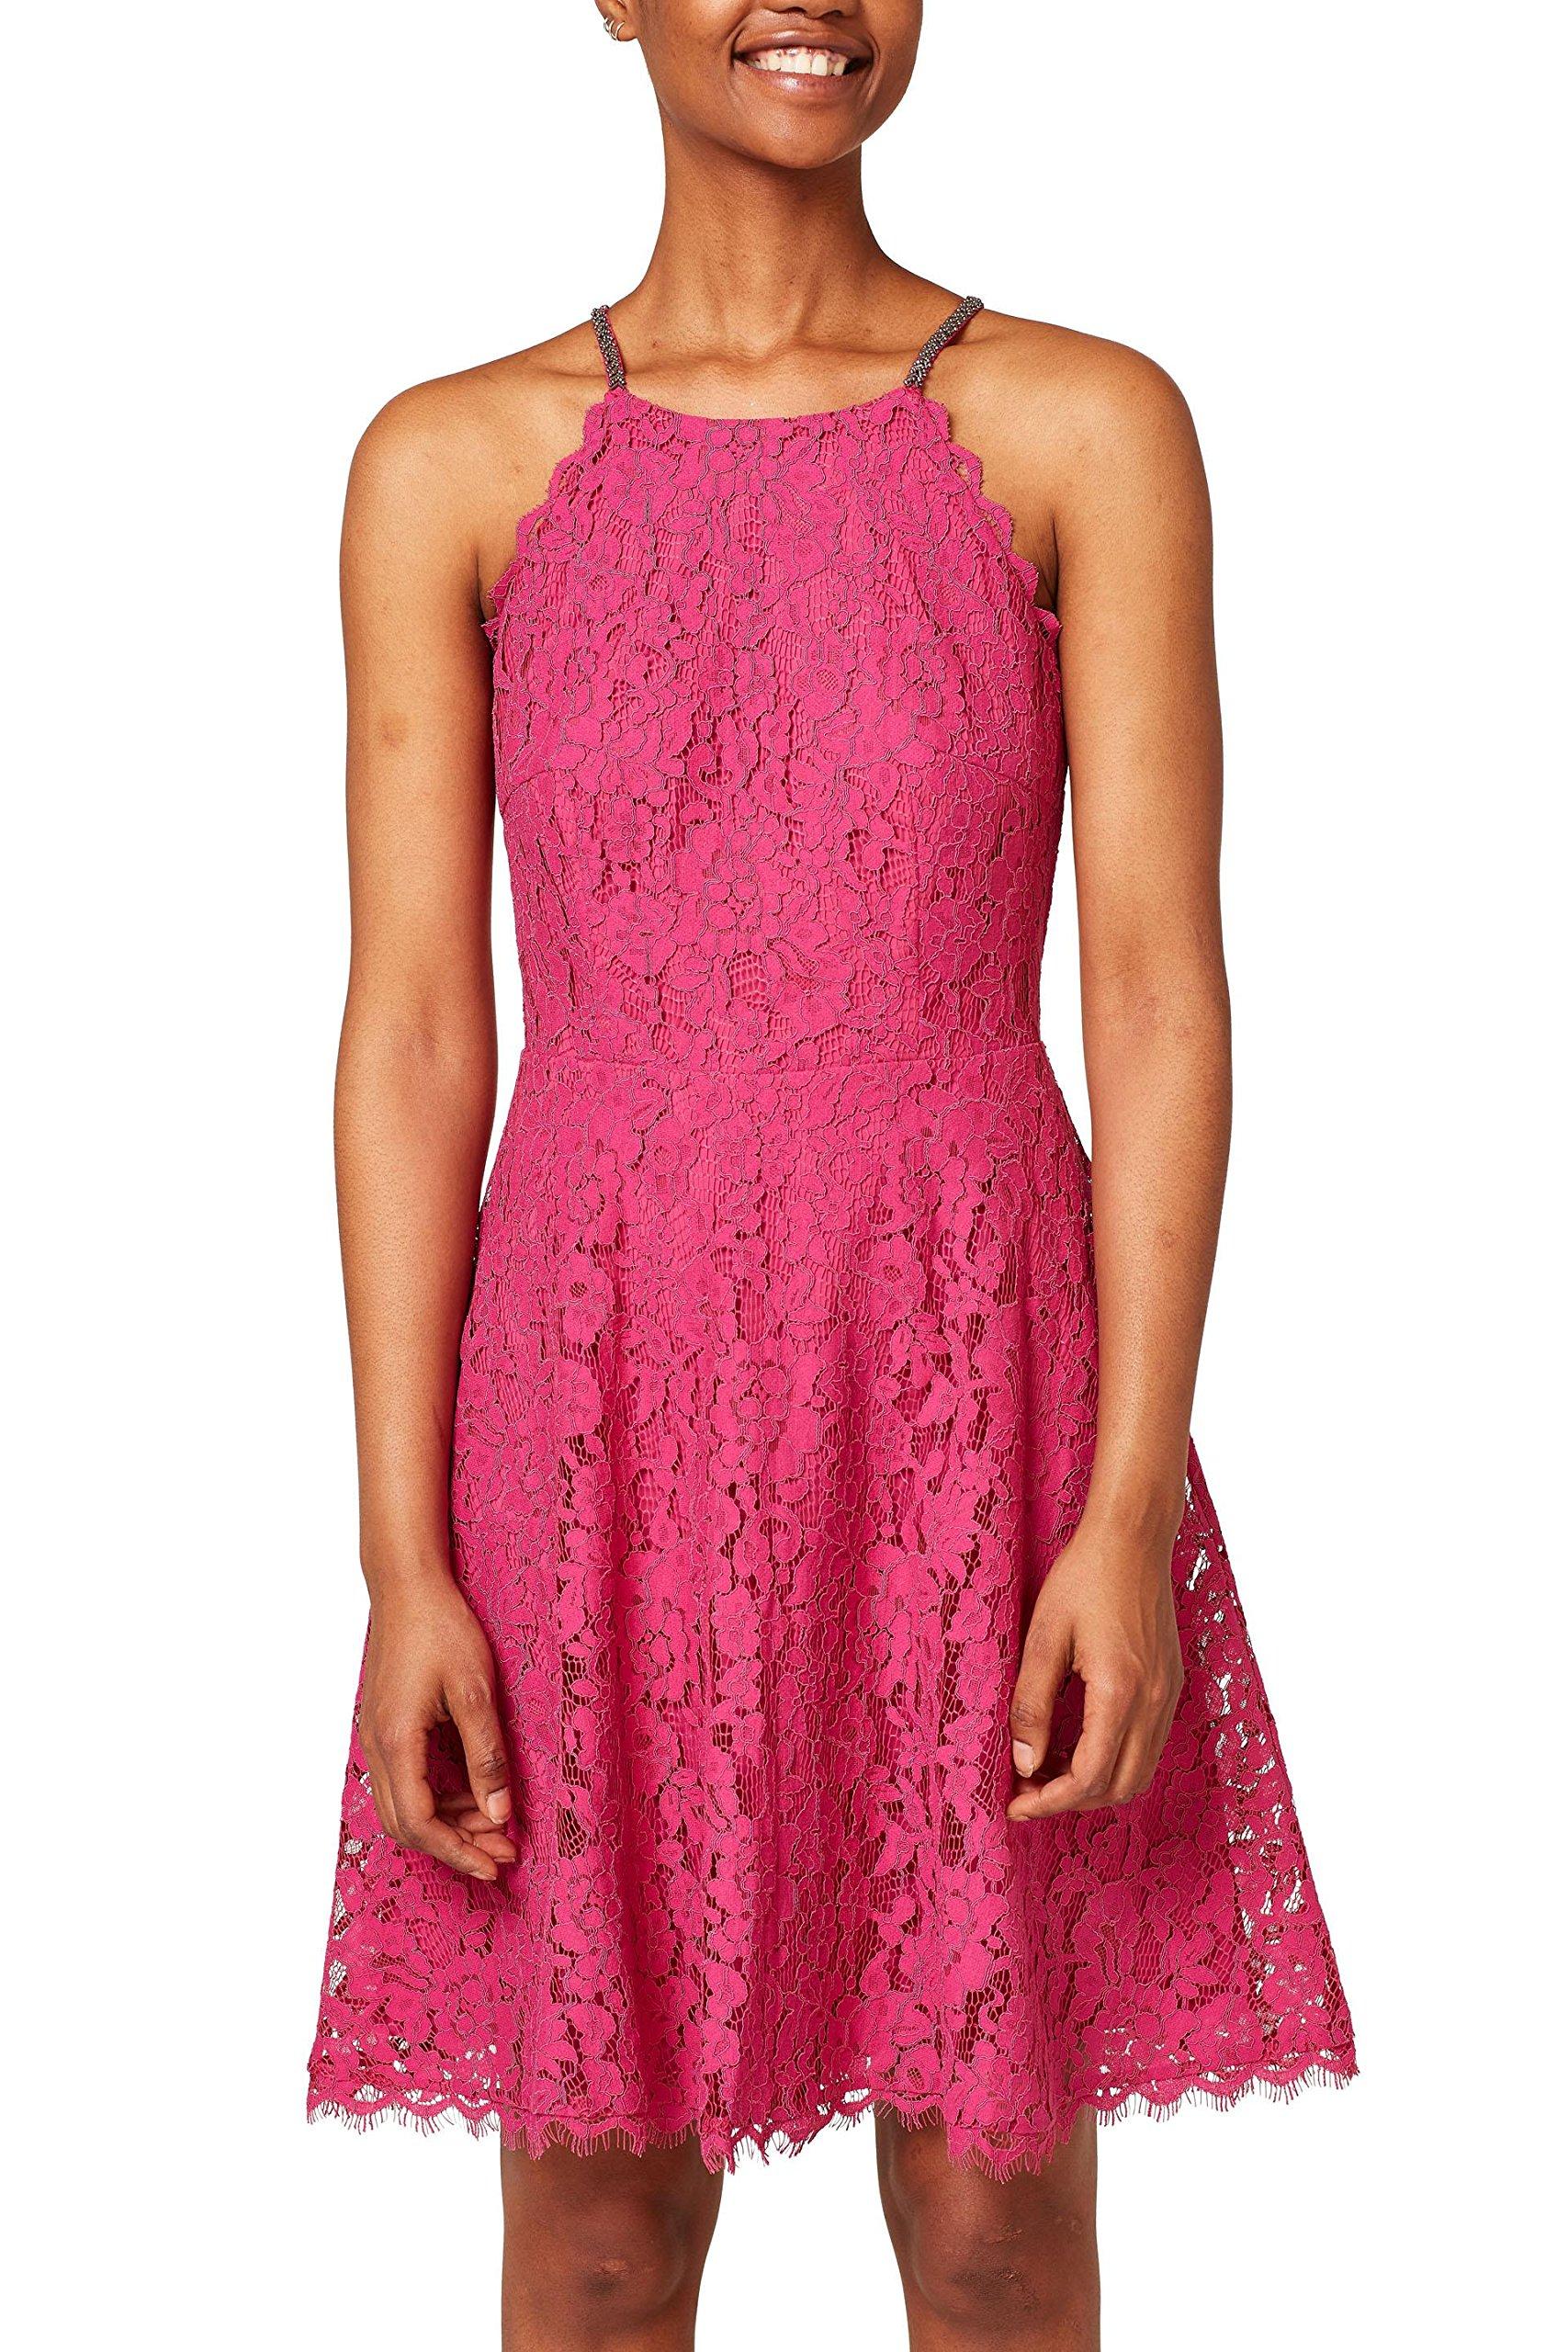 Collection Fabricant38Femme RobeRosedark 65040taille 048eo1e028 Esprit Pink 7gyb6YfvIm